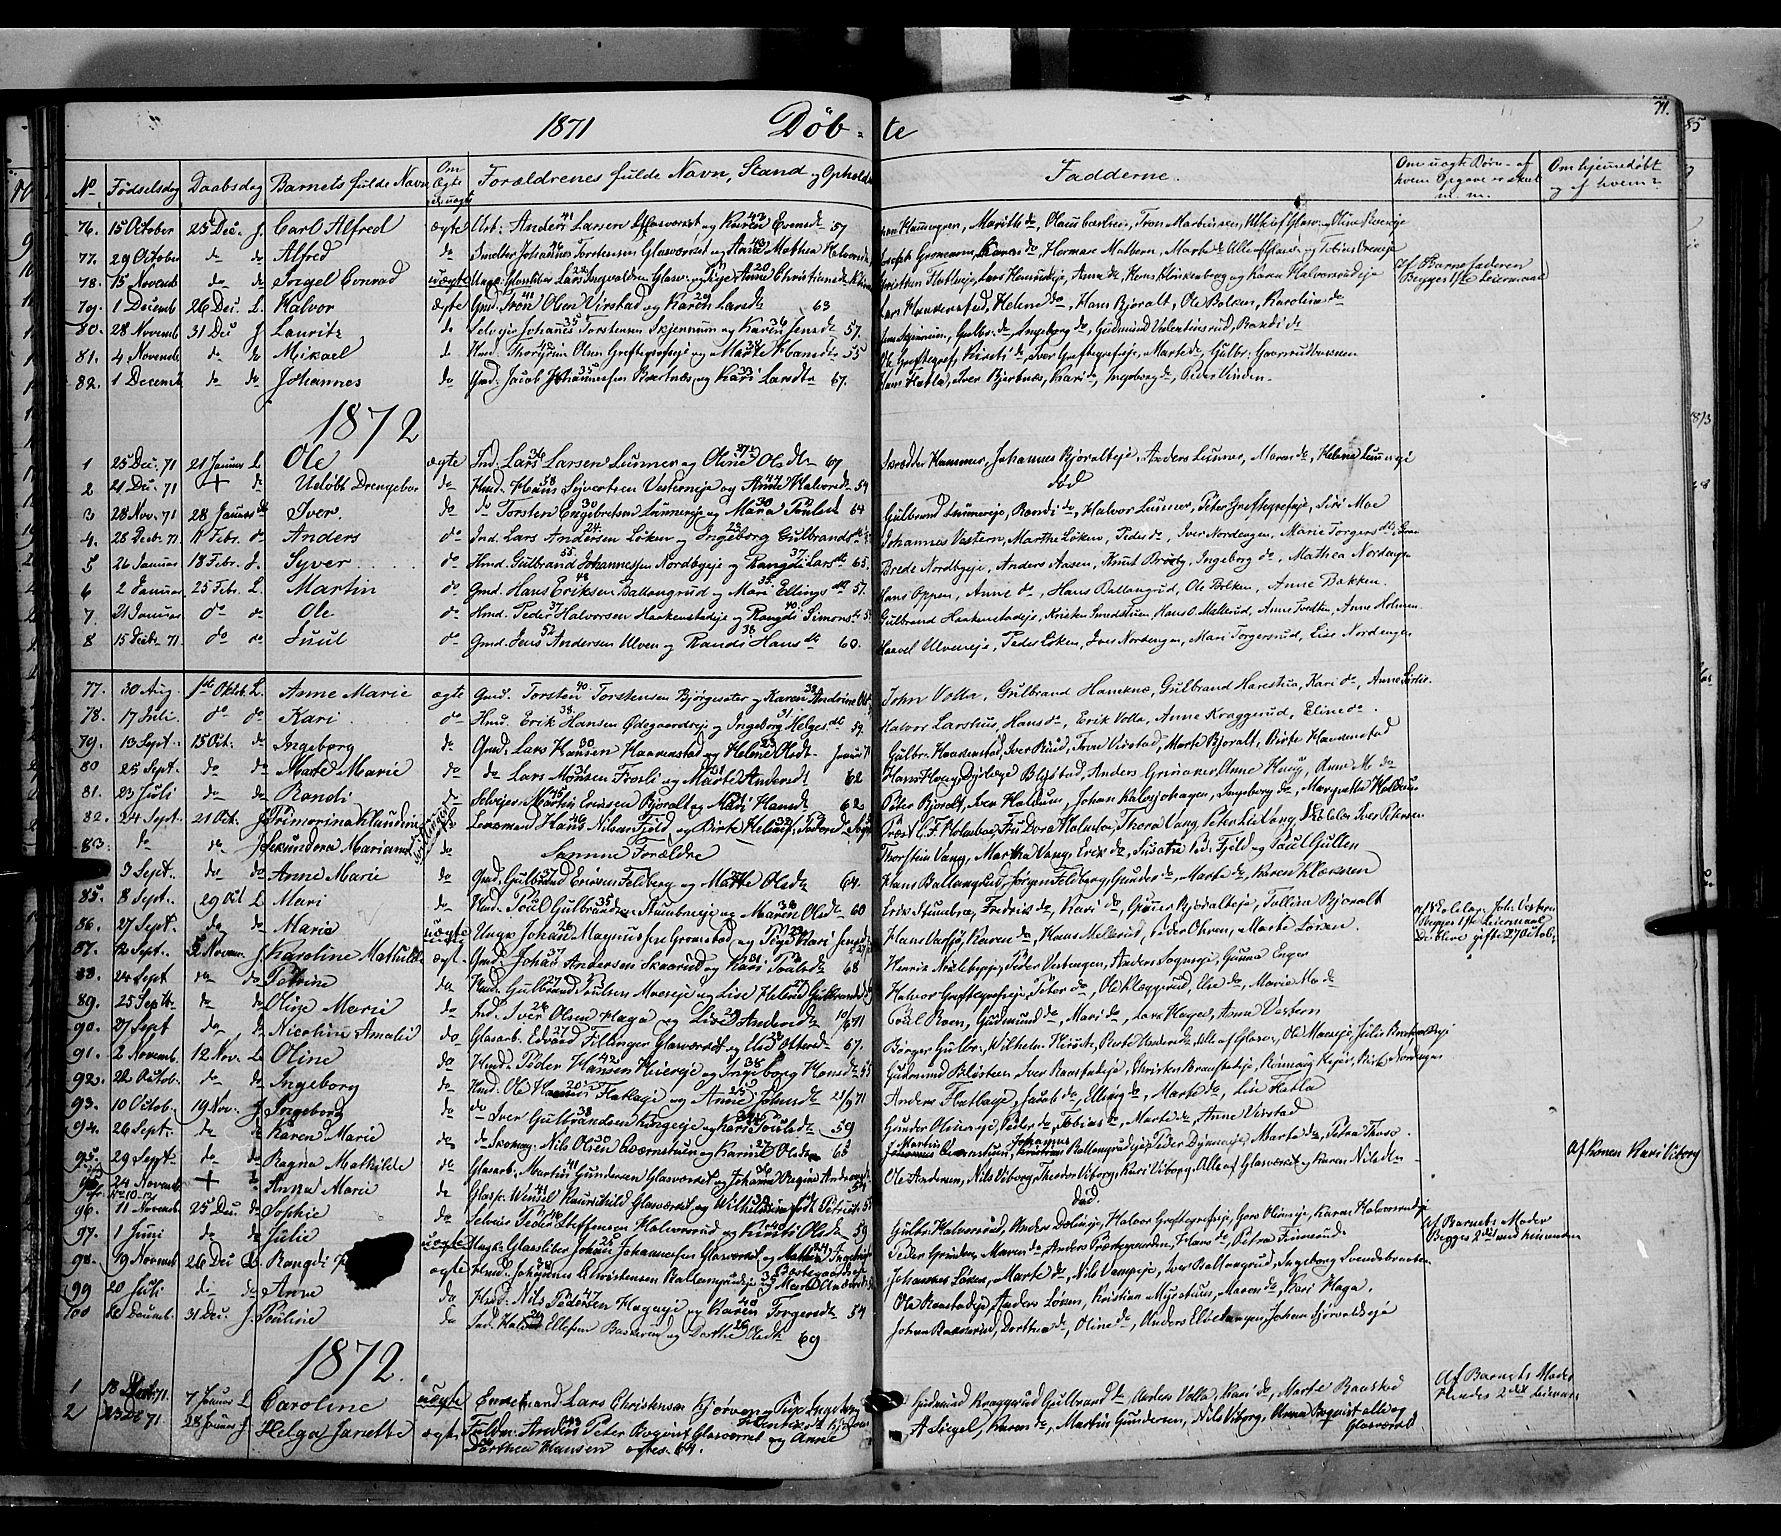 SAH, Jevnaker prestekontor, Ministerialbok nr. 7, 1858-1876, s. 71